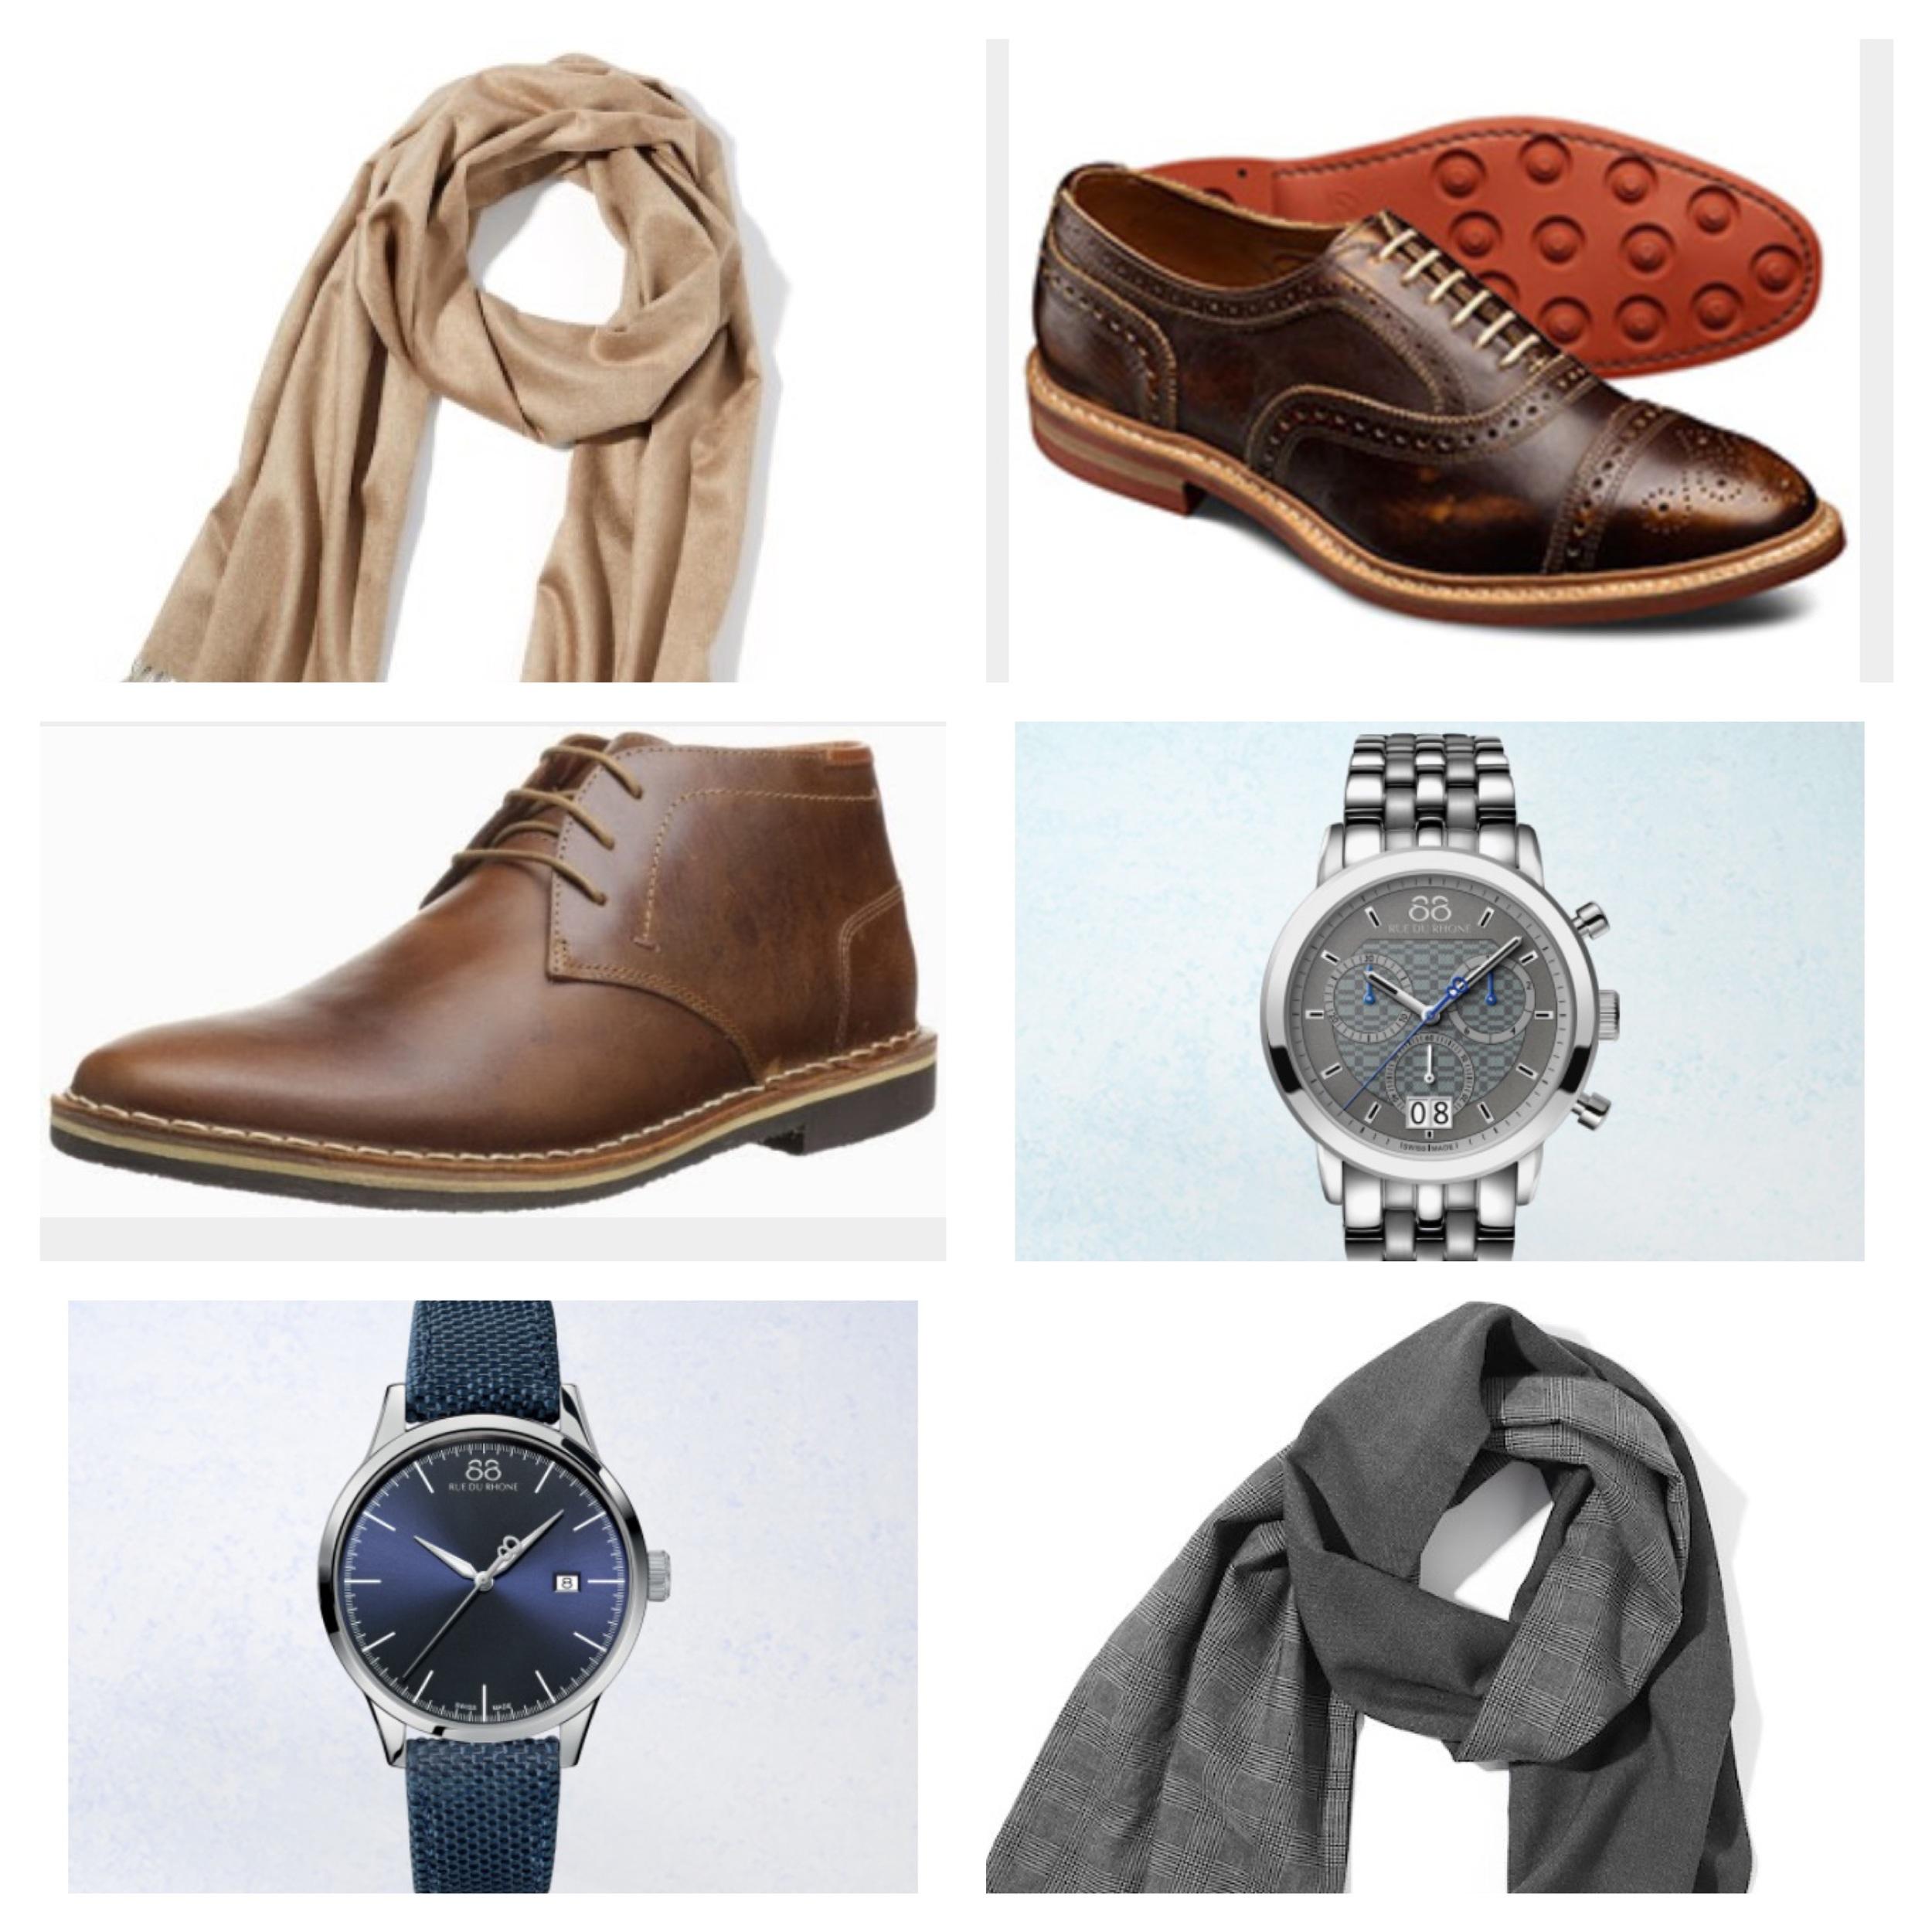 Row 1: Silk Solid Scarf , Allen Edmonds Strandmok Oxford ; Row 2: Steve Madden Harken Chukka Boot , 88 Rue de Rhone watch ; Row 3: 88 Rue de Rhone 45mm Quarttz Chrono watch , Grey Tonal Scarf